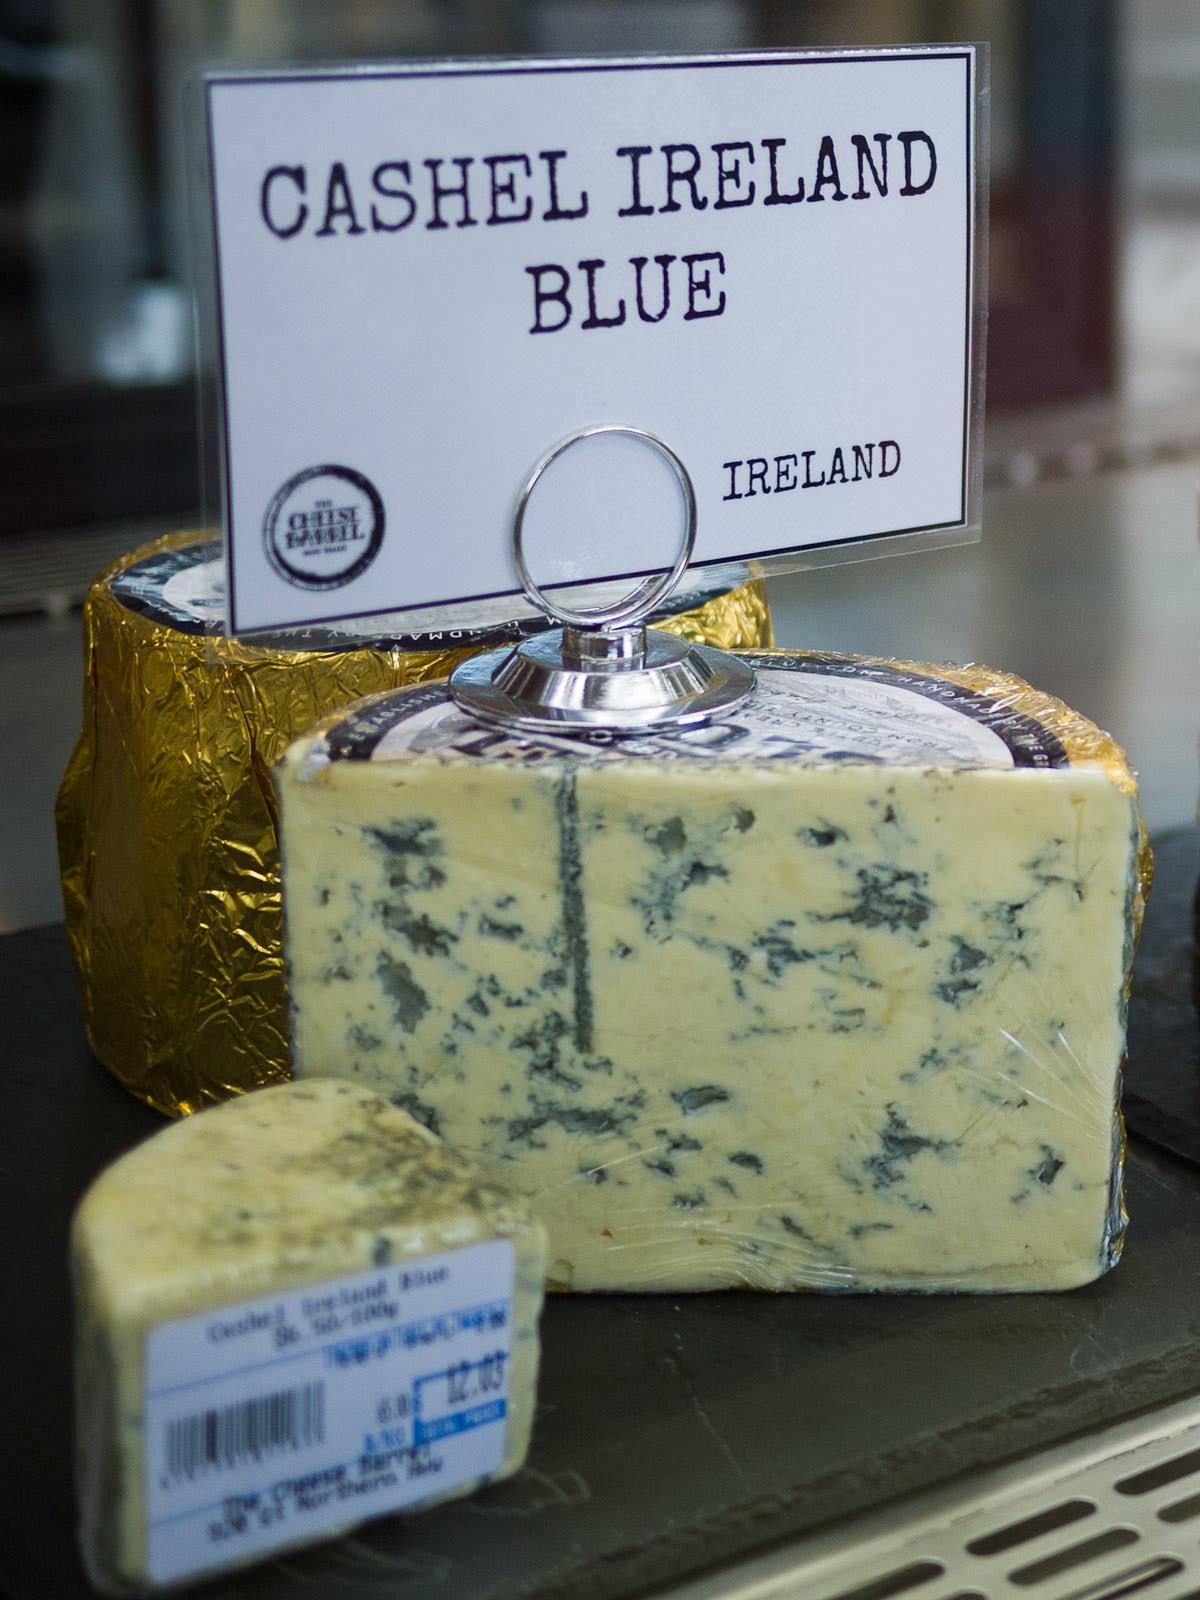 Cassel Ireland Blue